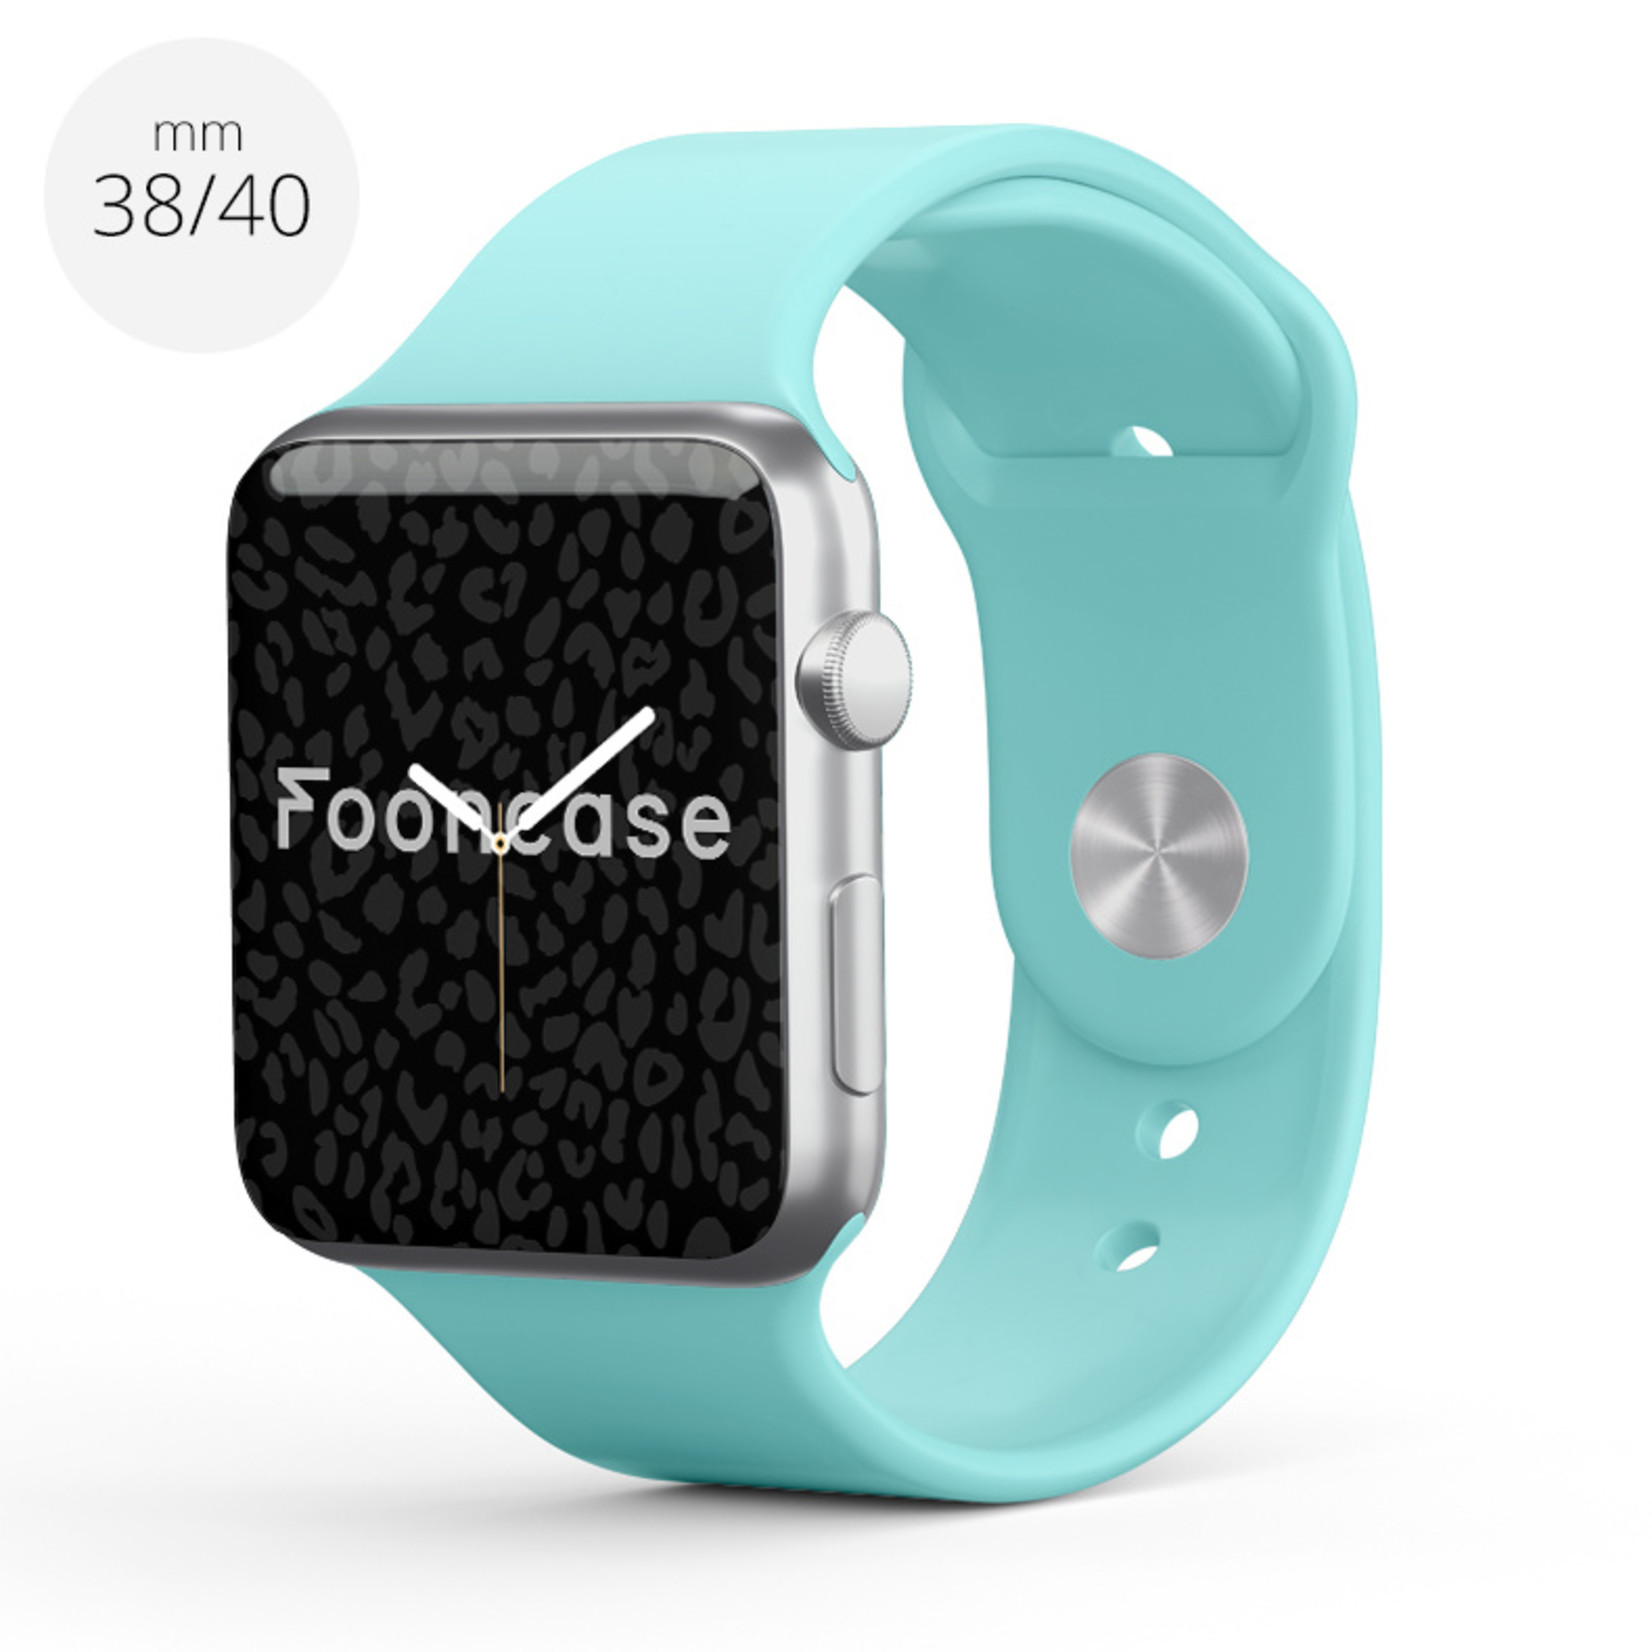 FOONCASE Apple Watch Series (1 t/m 6 / SE) - Aqua - 38/40mm